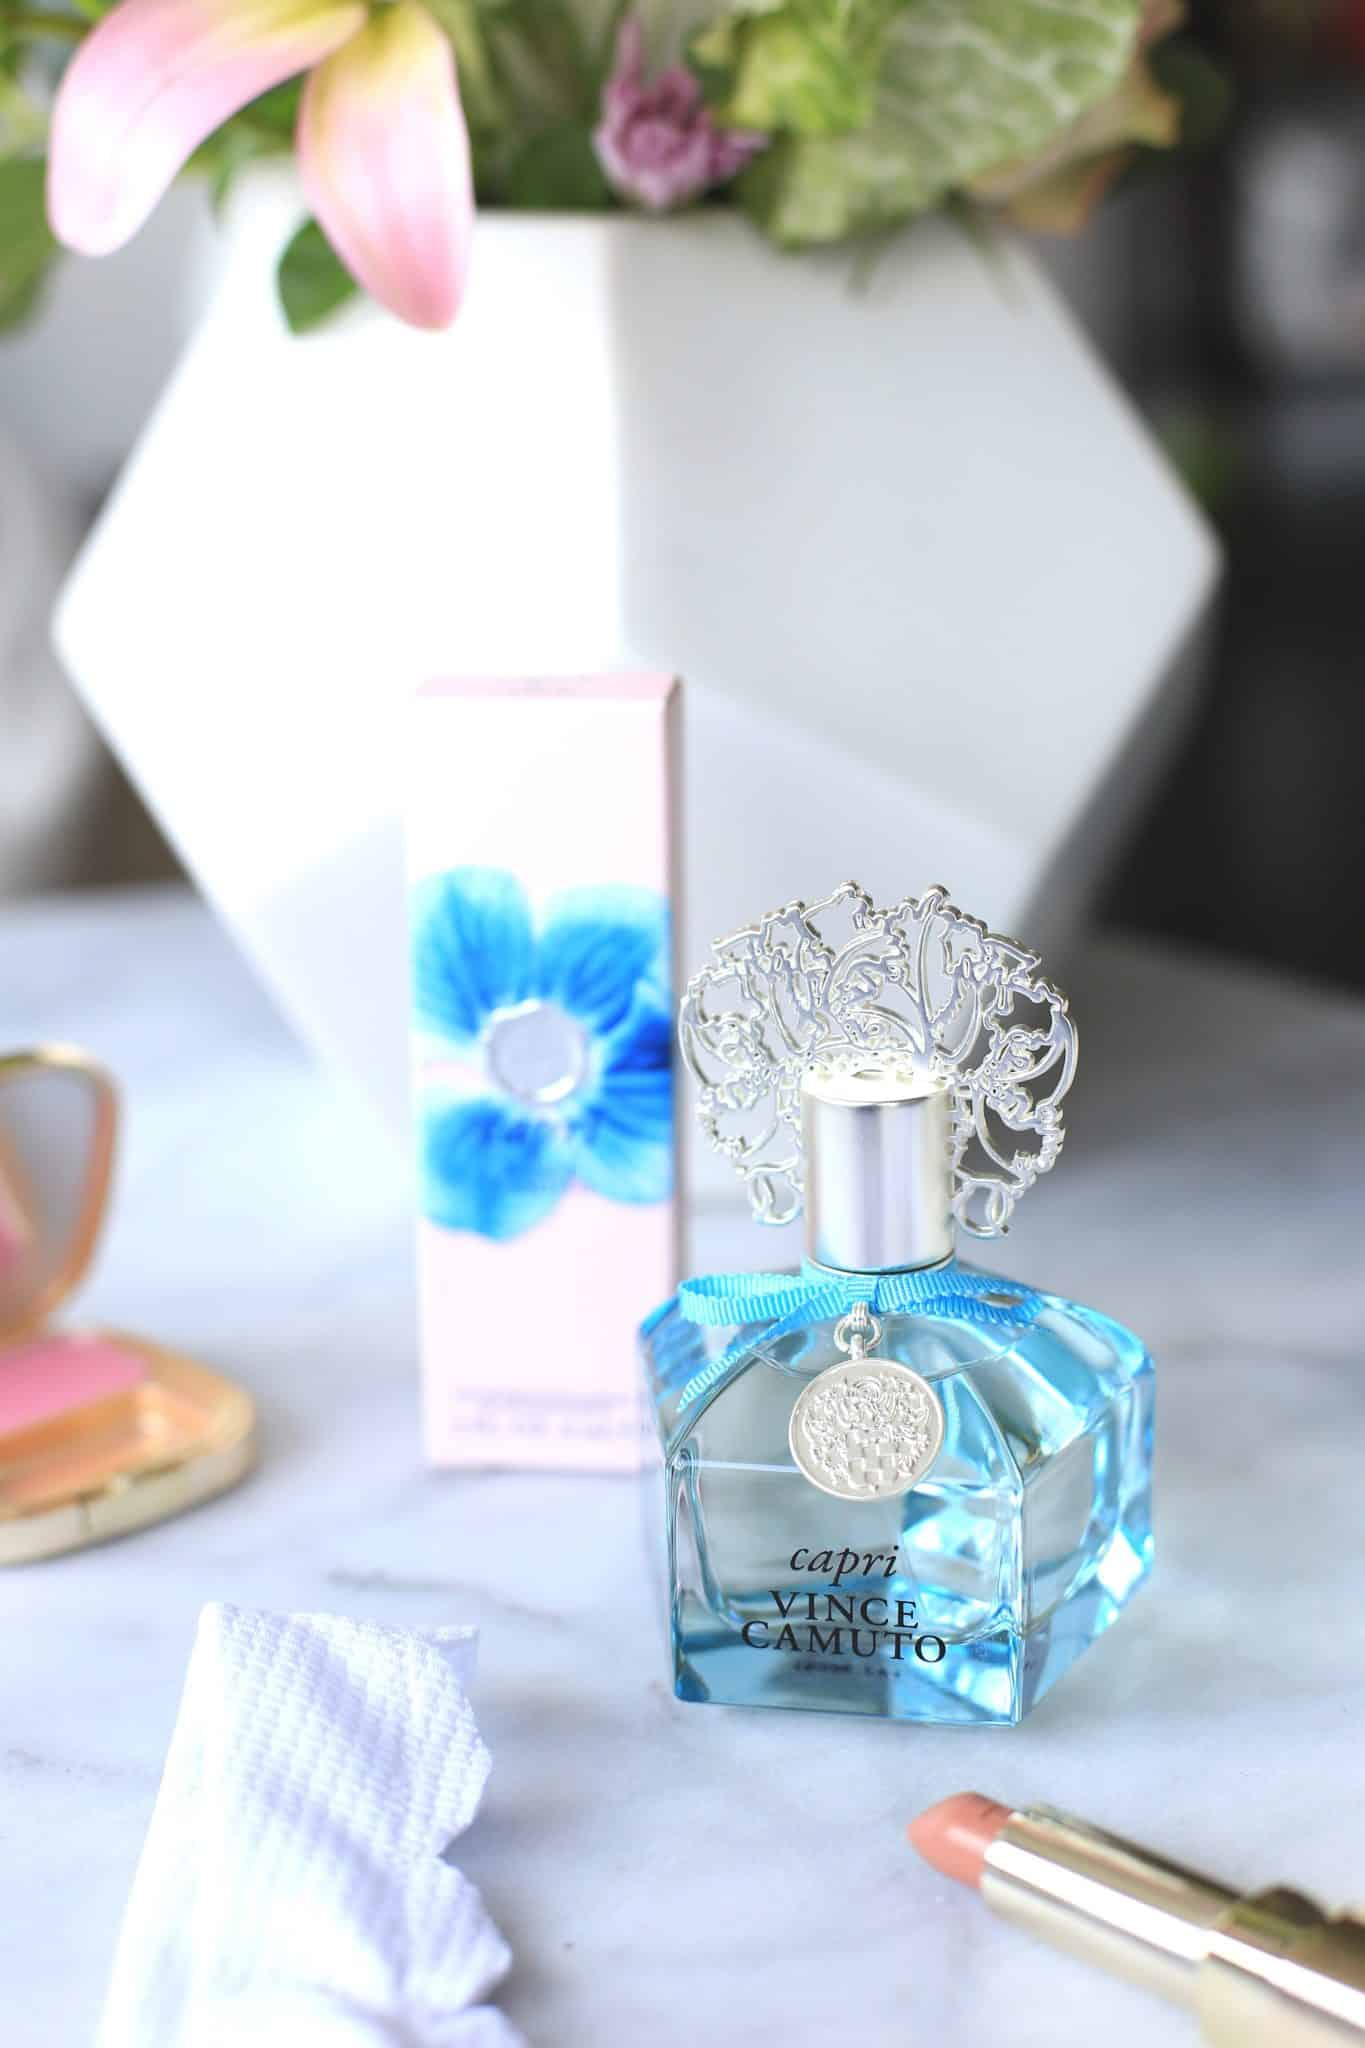 capri vince camuto fragrance - 1 (4)